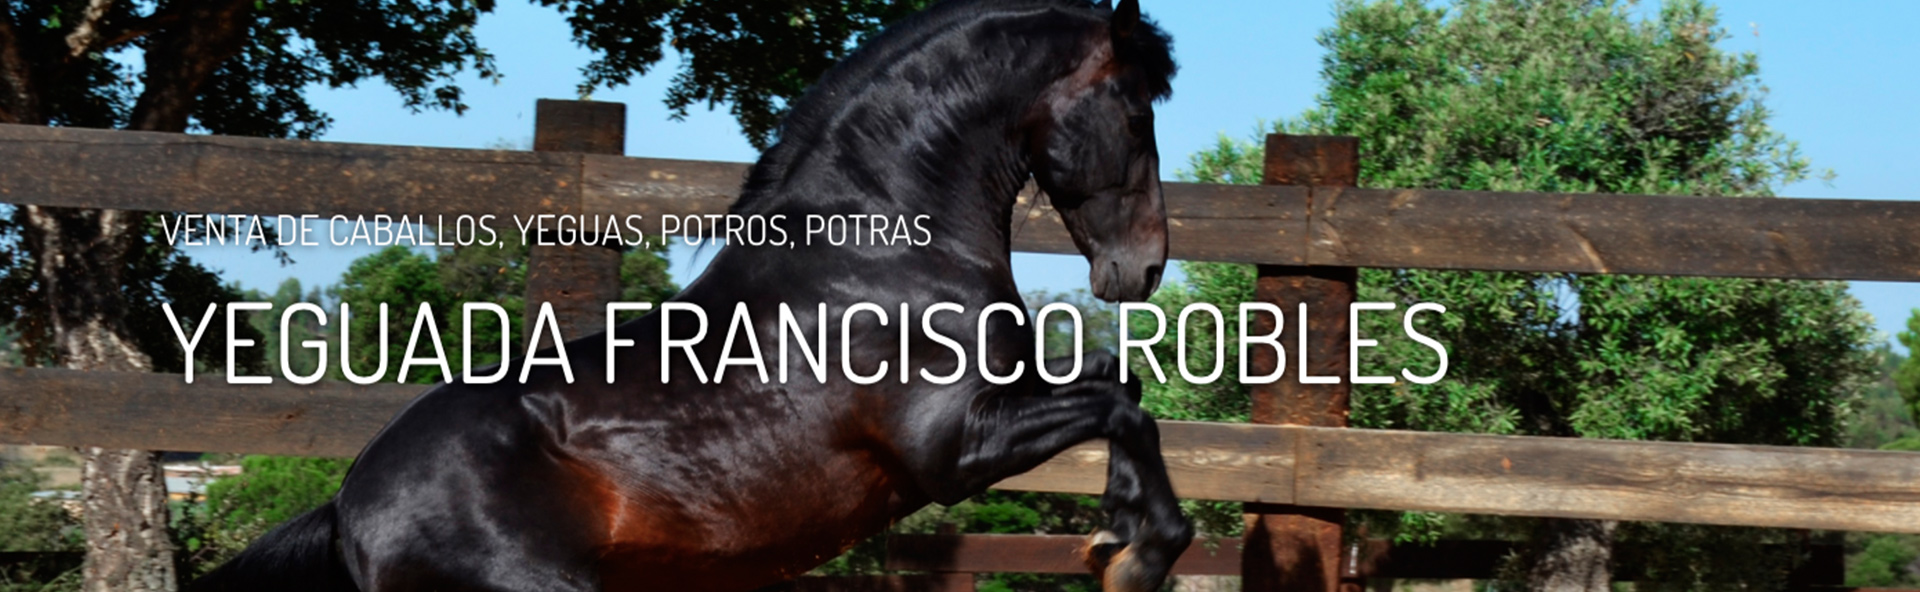 Venta de caballos de pura raza española